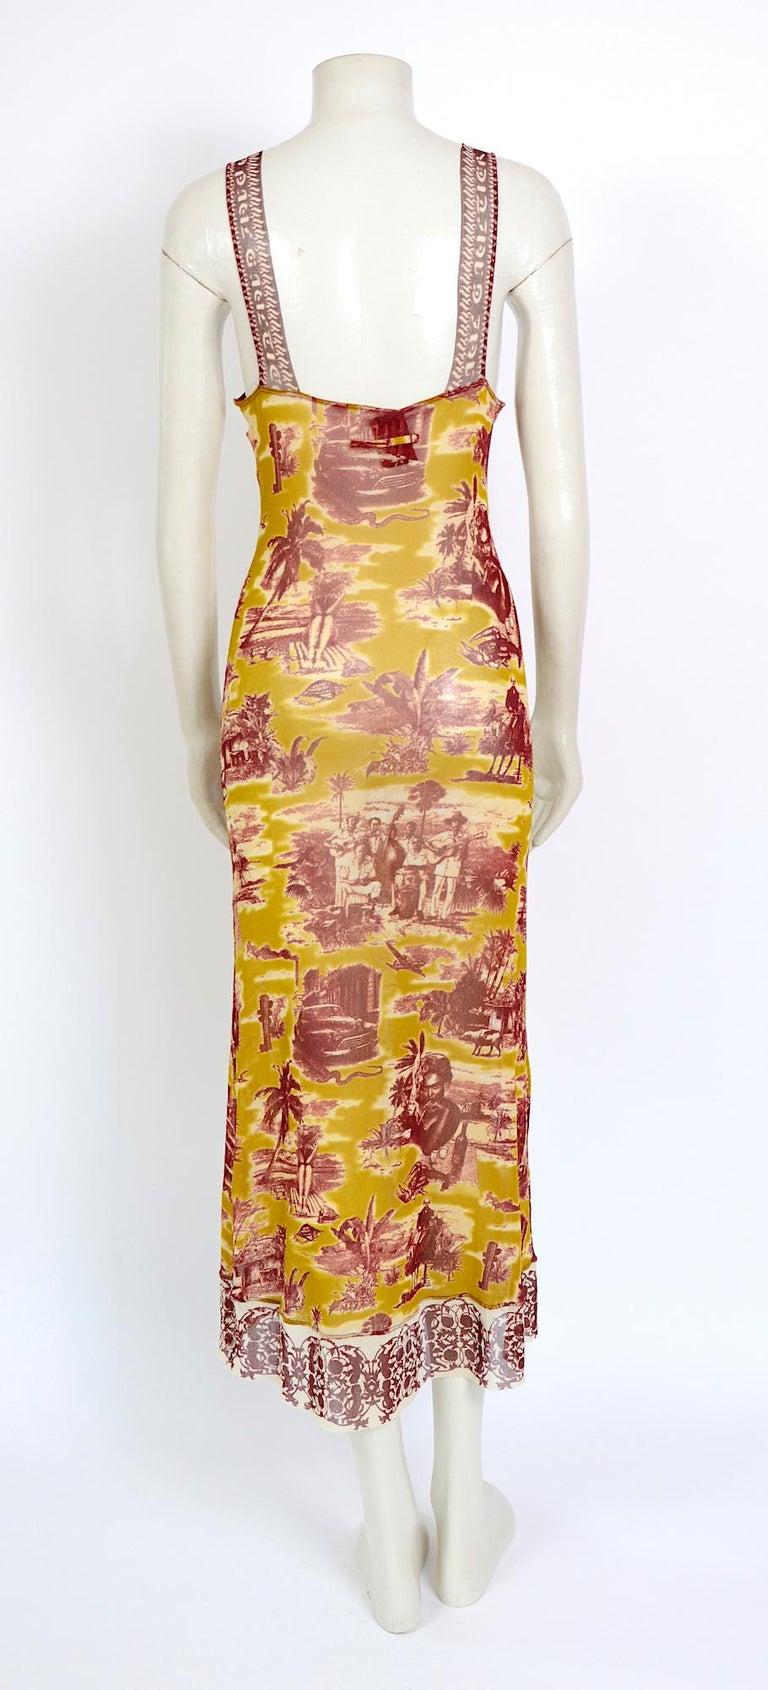 Jean Paul Gaultier classique vintage 1990s cuba print + nude mesh slip dresses  For Sale 3